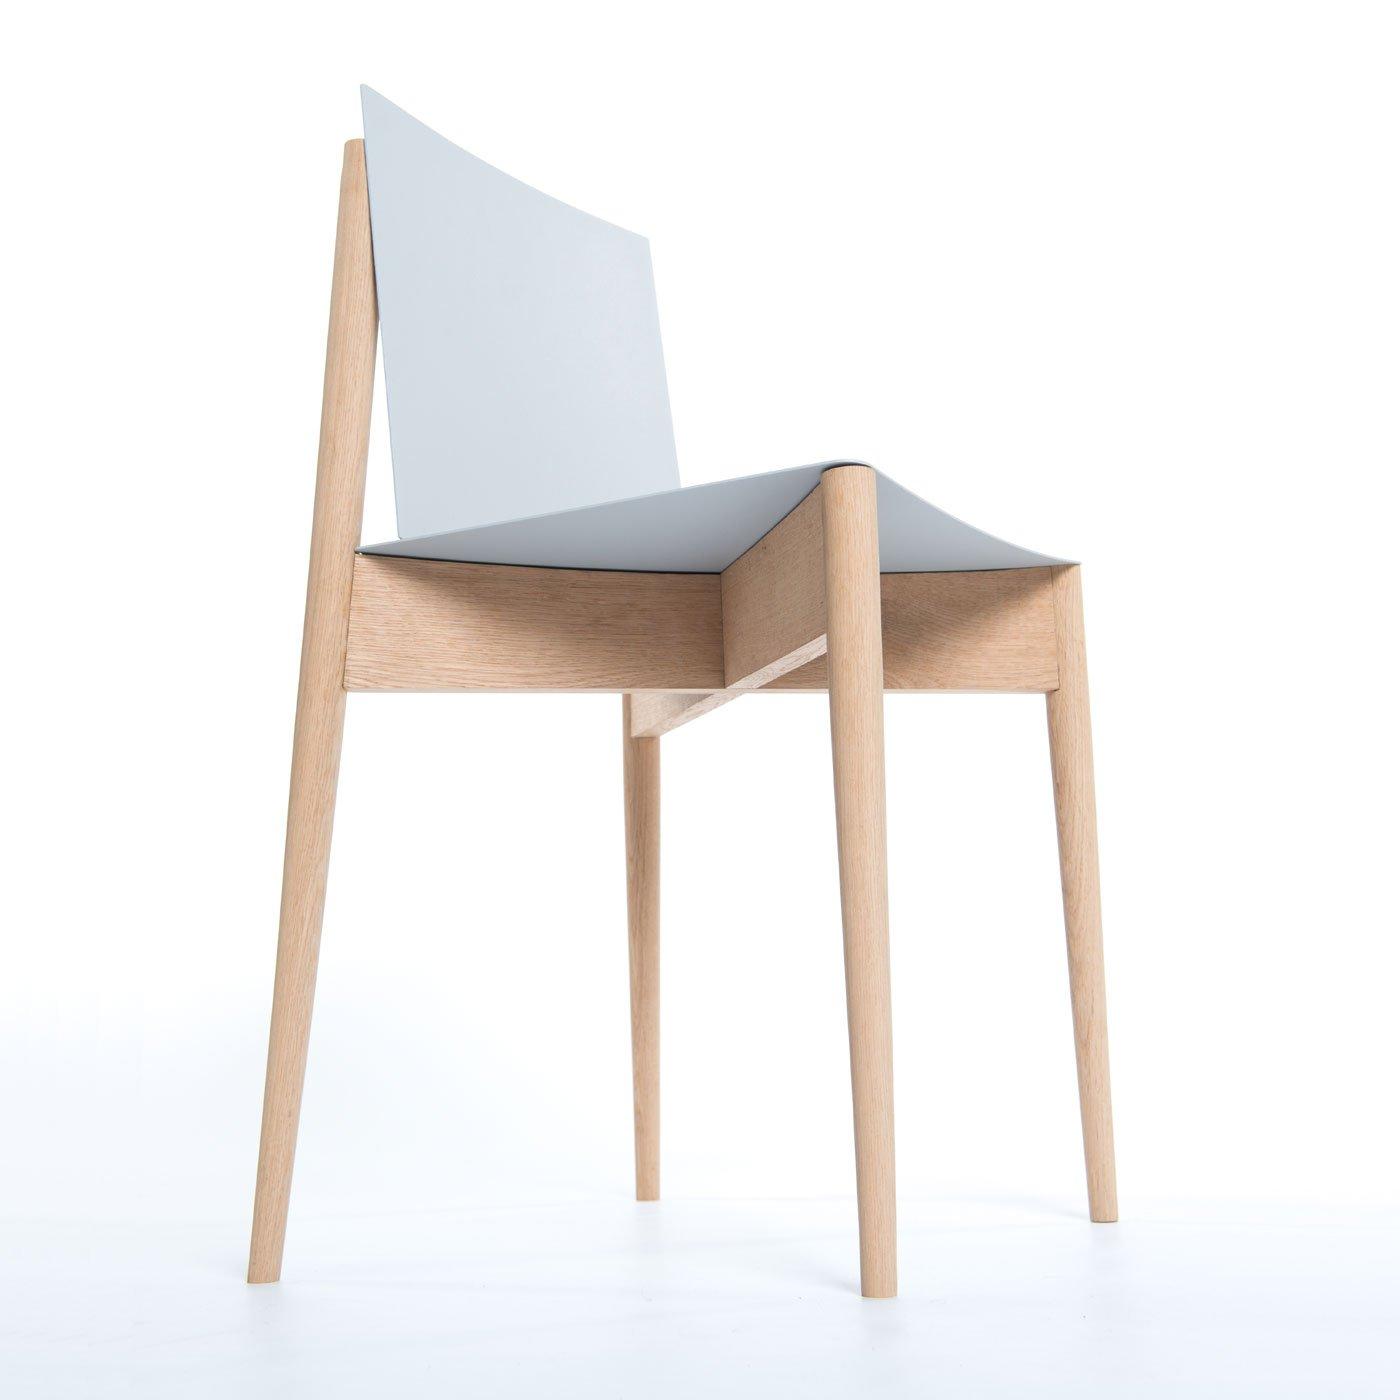 Magnetic Furniture By Benjamin Vermeulen